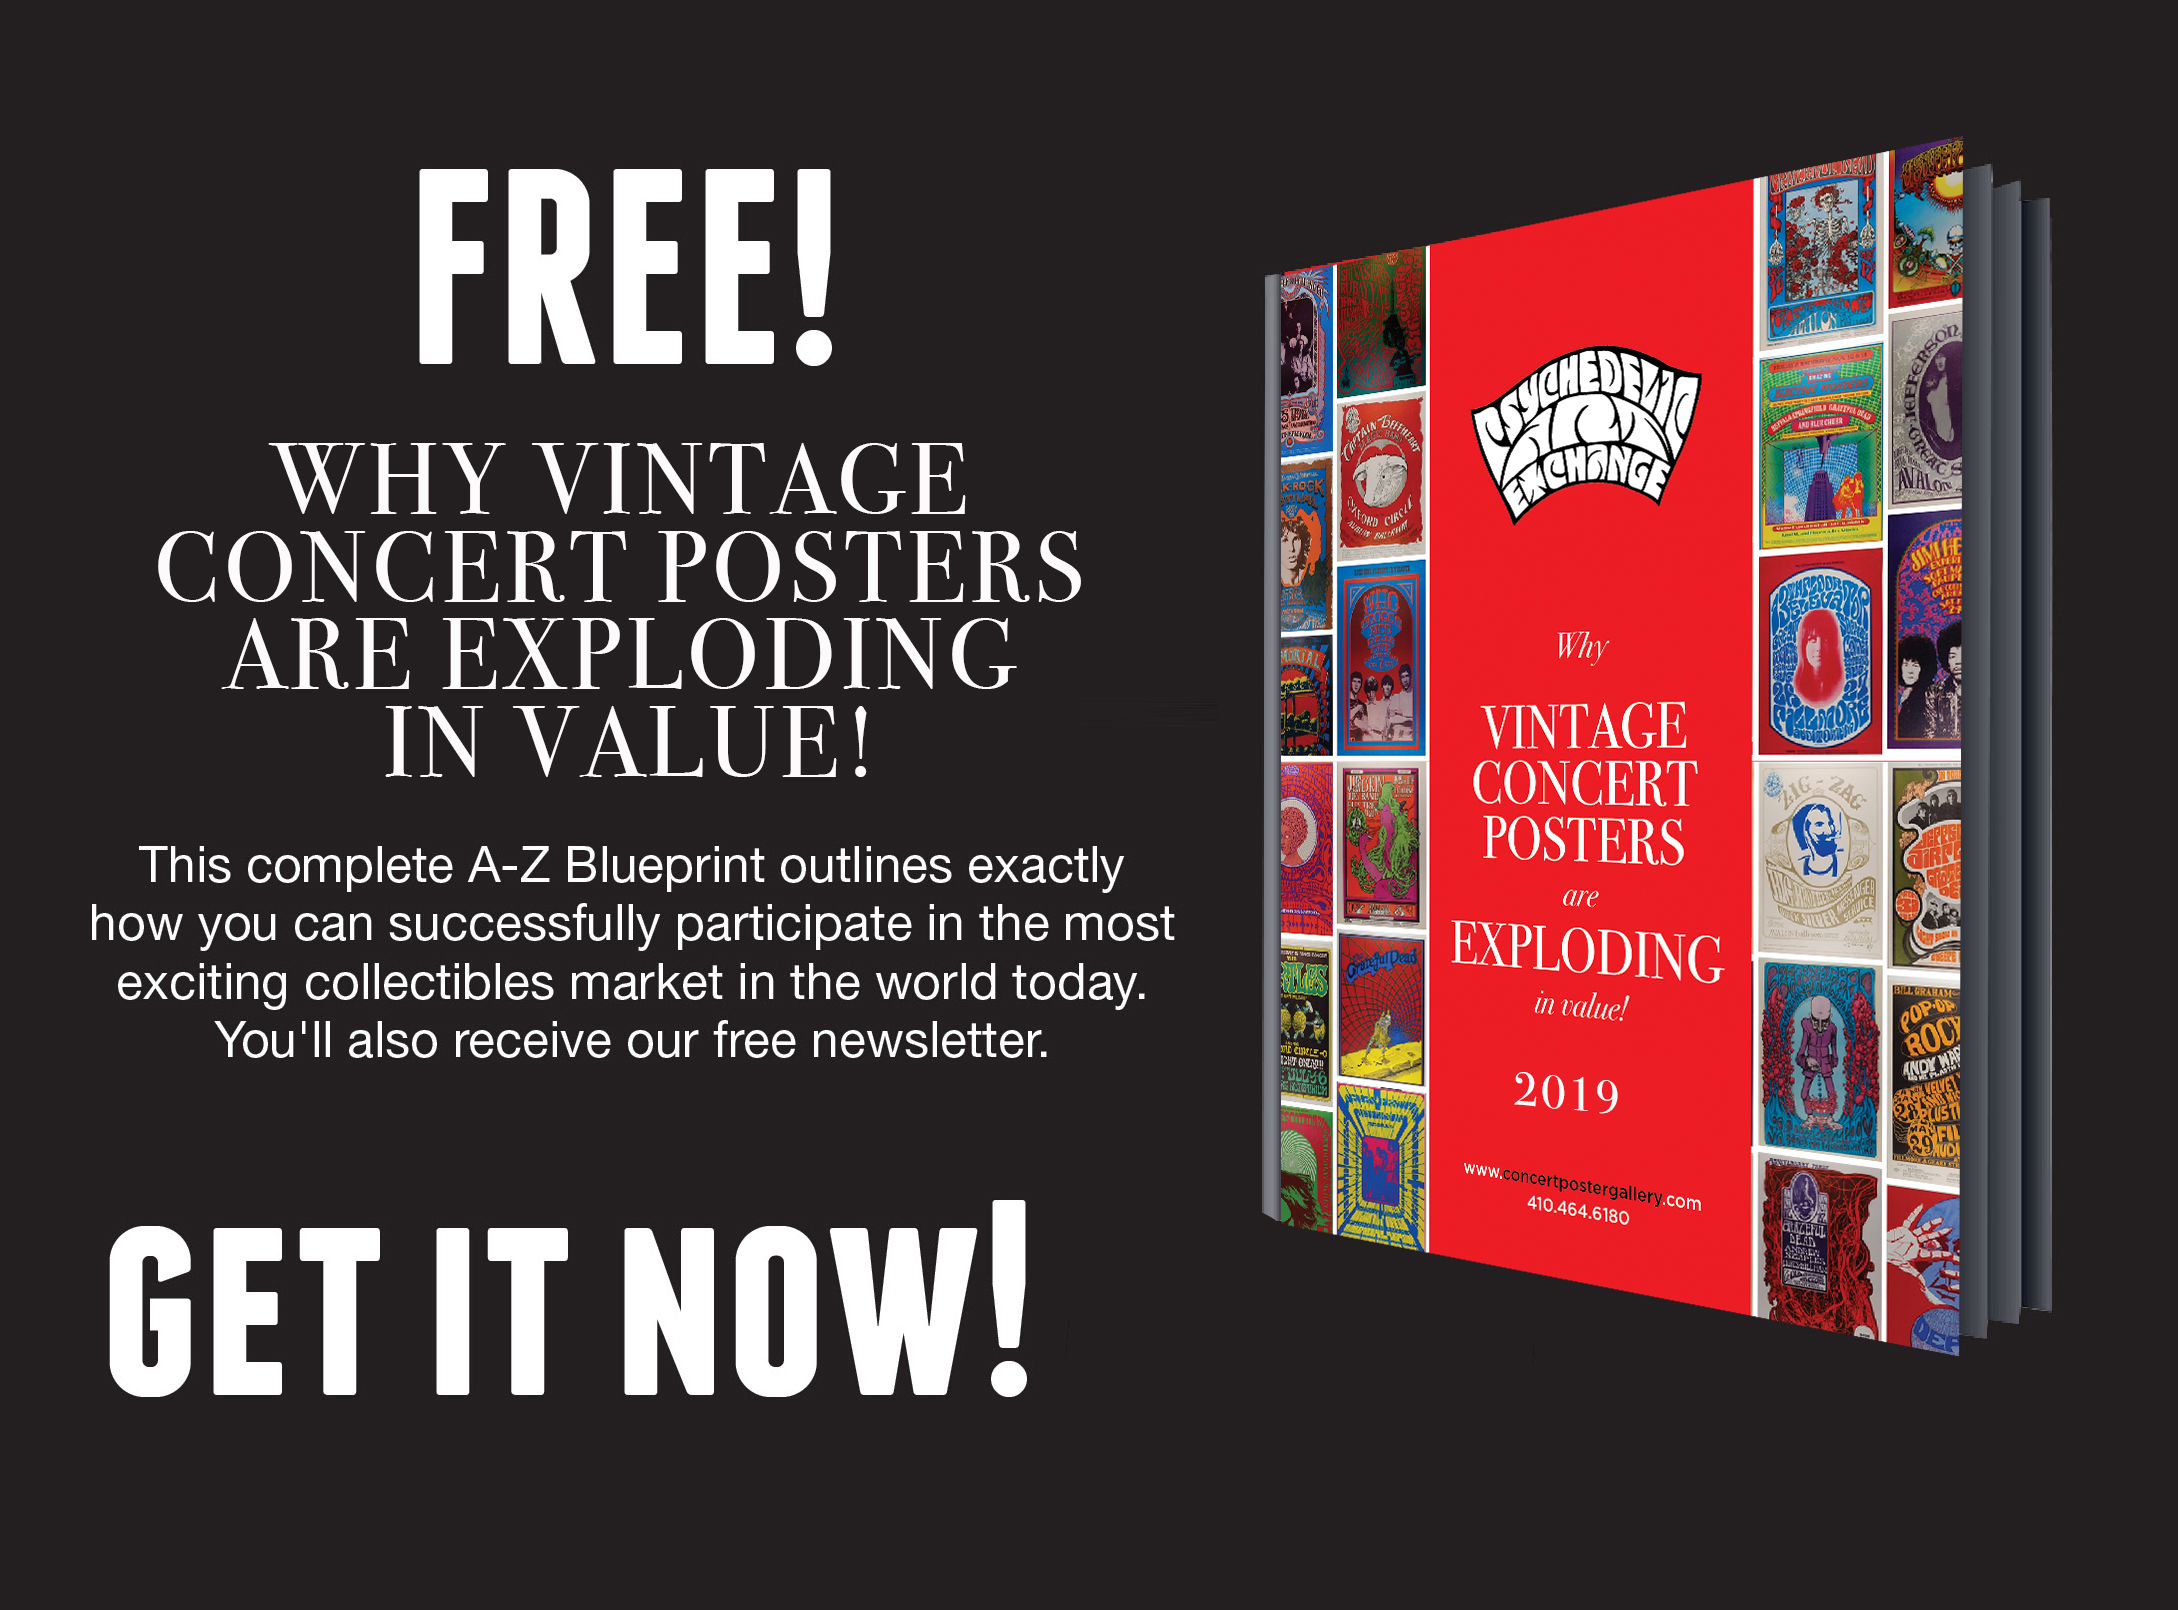 FREE 2019 Vintage Concert Posters Blueprint